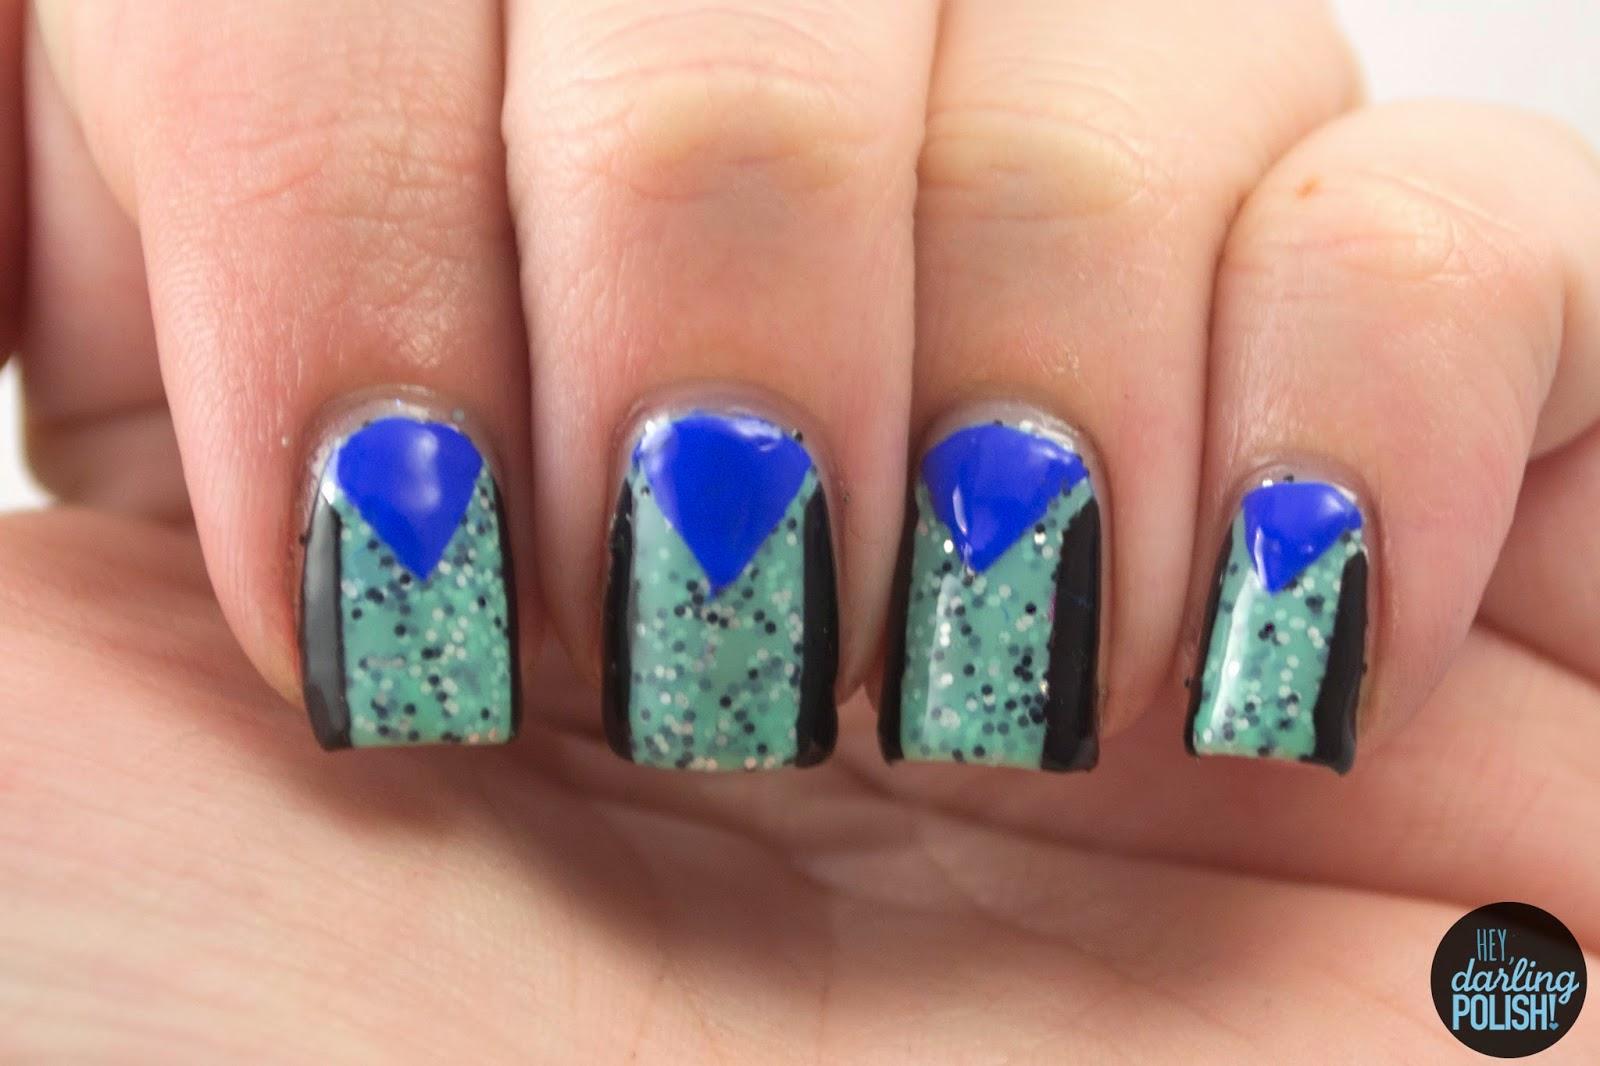 nails, nail art,  nail polish, polish, the never ending pile challenge, green, blue, black, hey darling polish, challenge